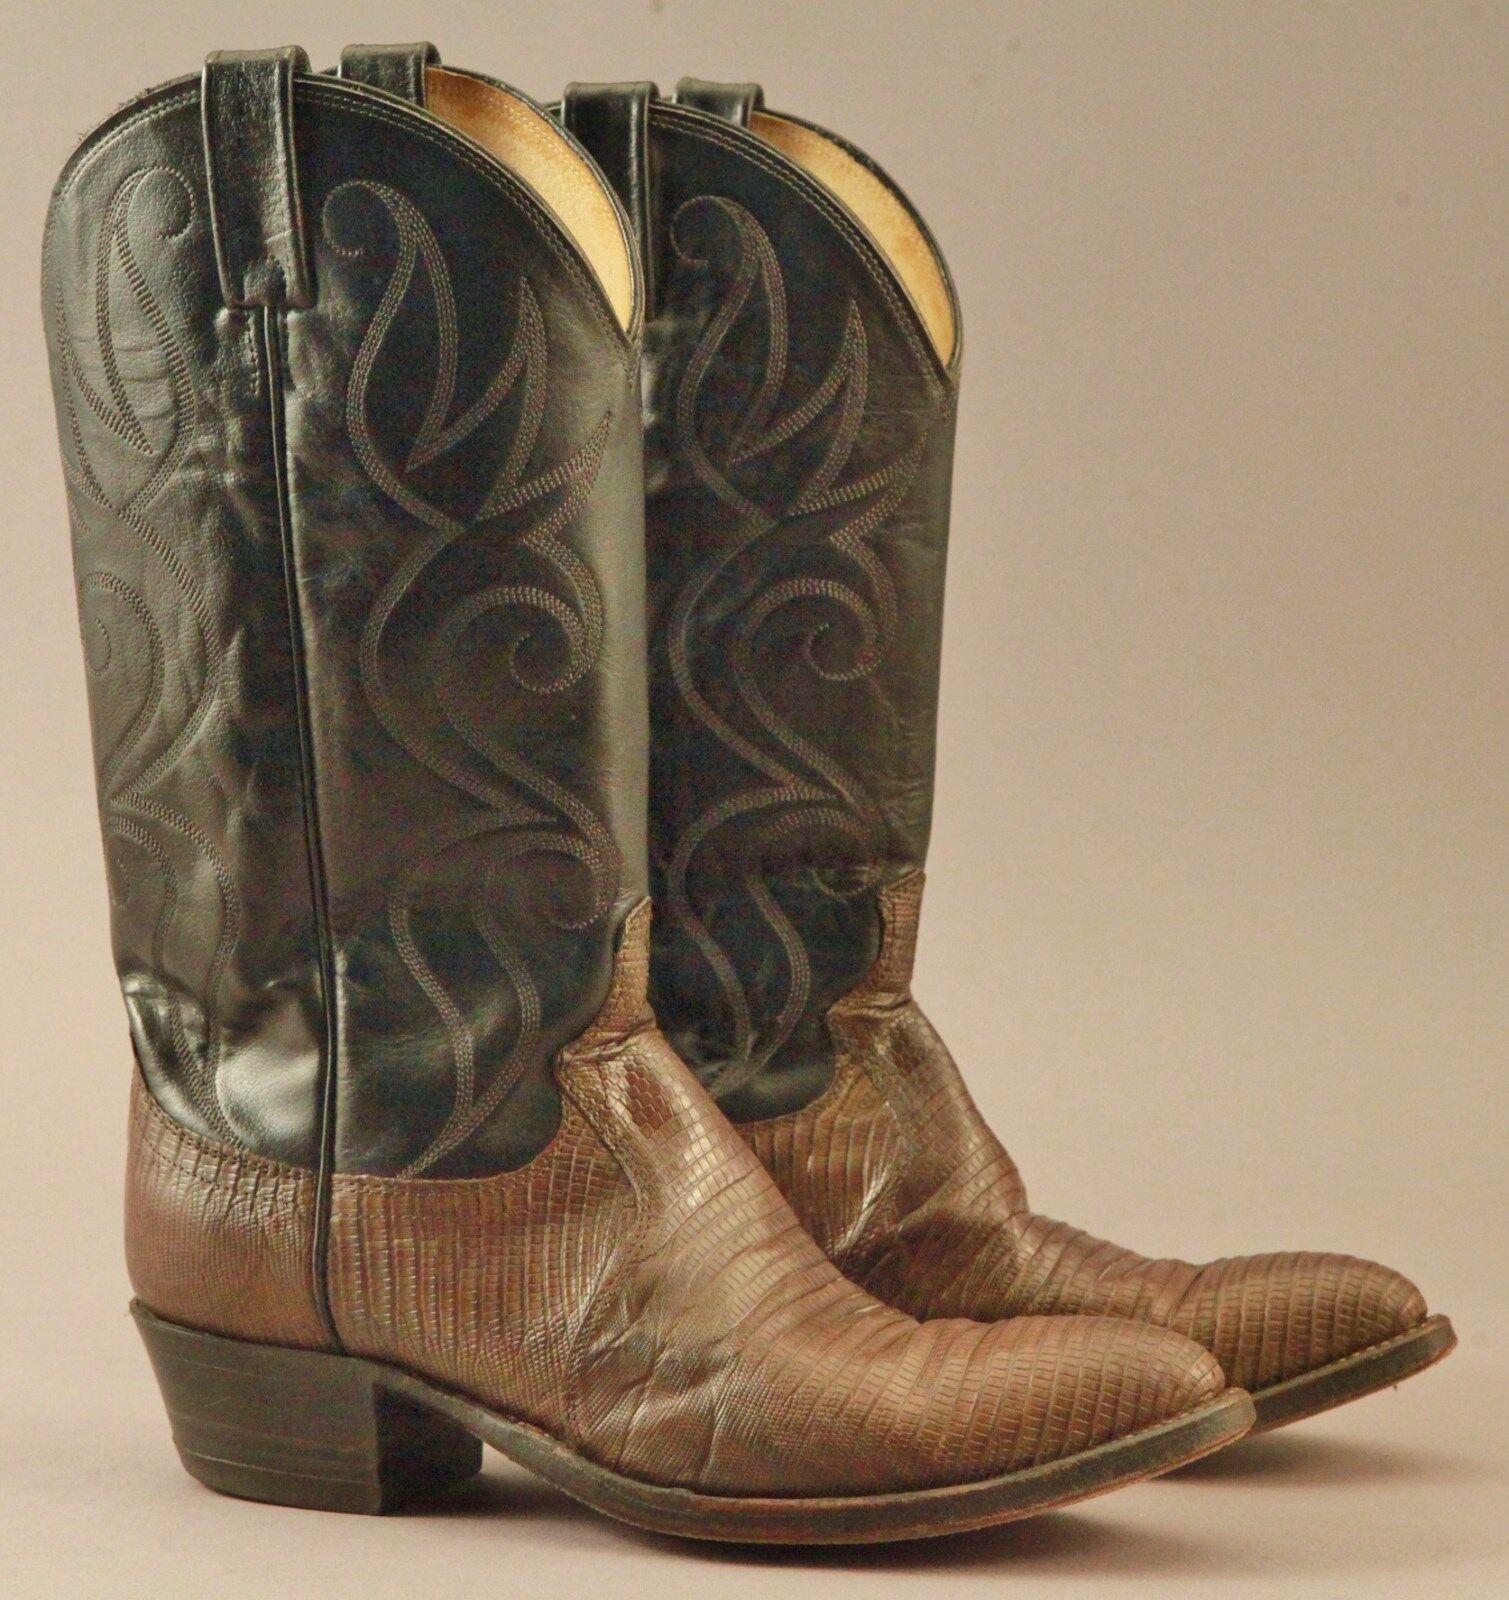 Excellent Vintage Dan Post Lizard Cowboy Cowboy Cowboy Western Stivali Rodeo 8 1/2 D 9237a8